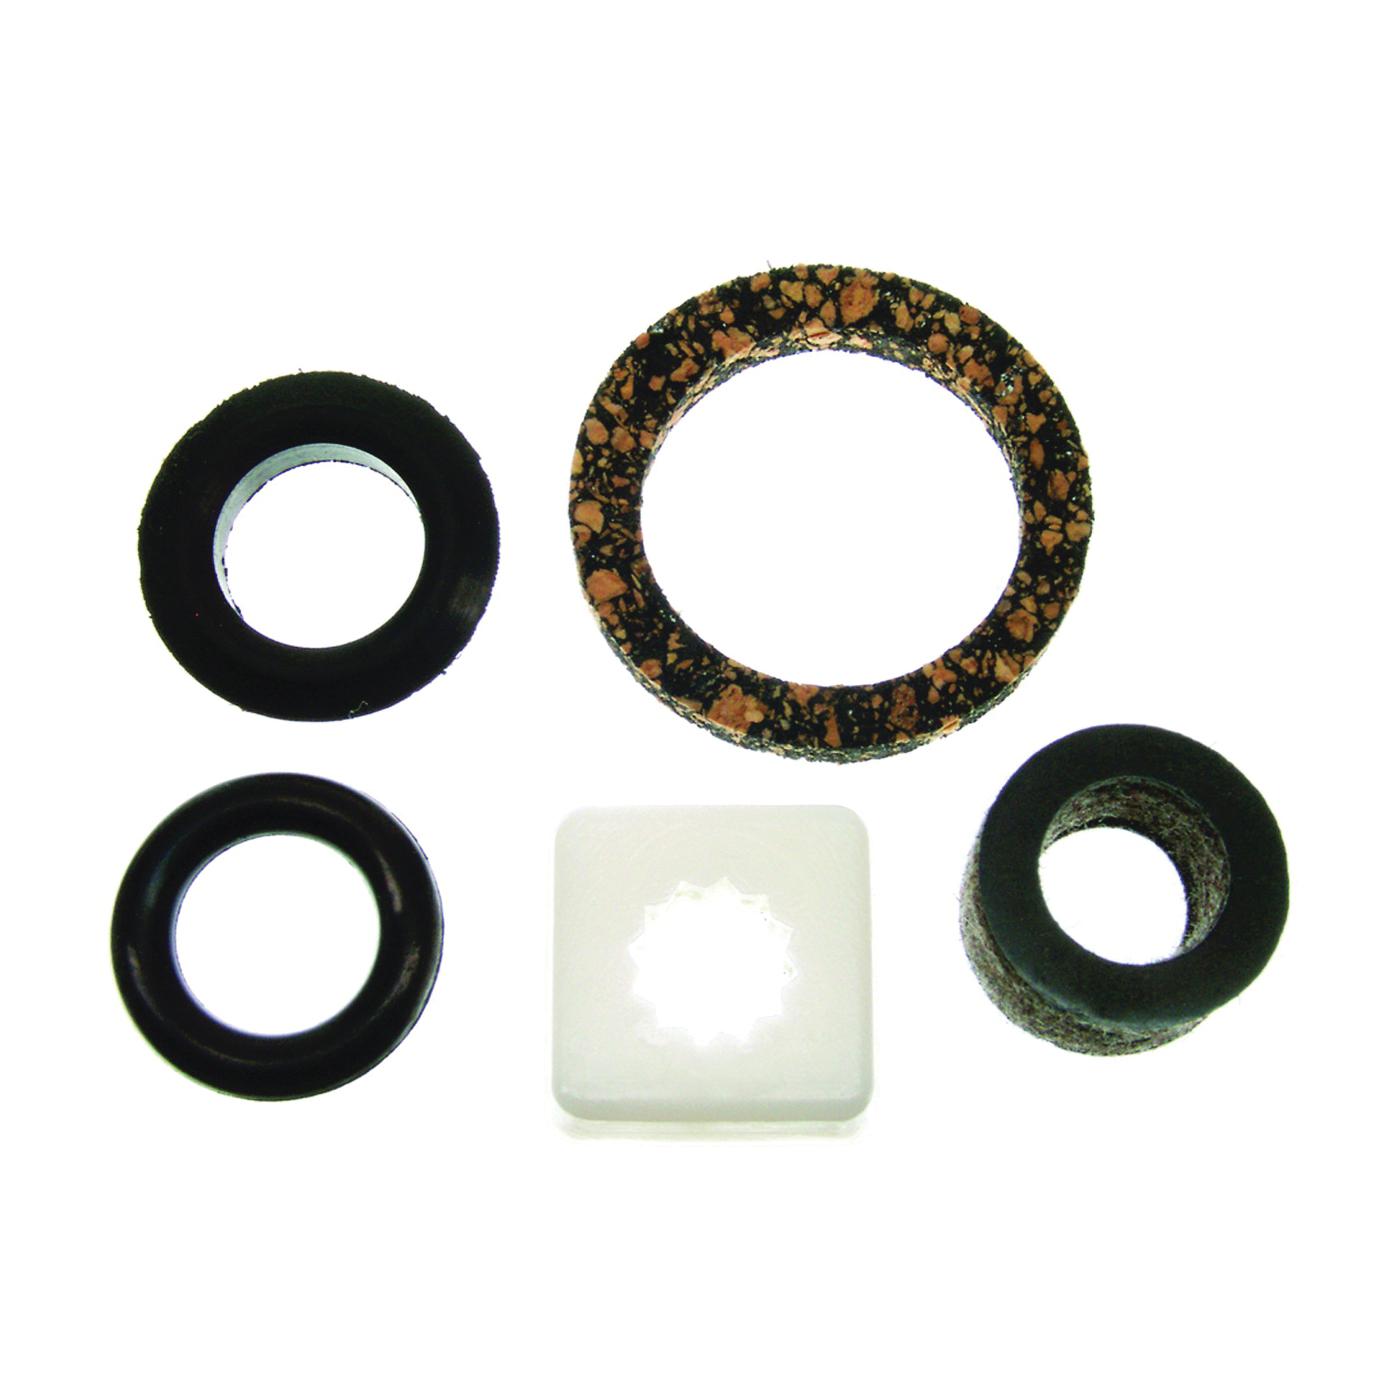 Picture of Danco 80042 Stem Repair Kit, For: Crane Dialeze Stem ID #5A-1, #5A-2, #5A-3, #5A-4